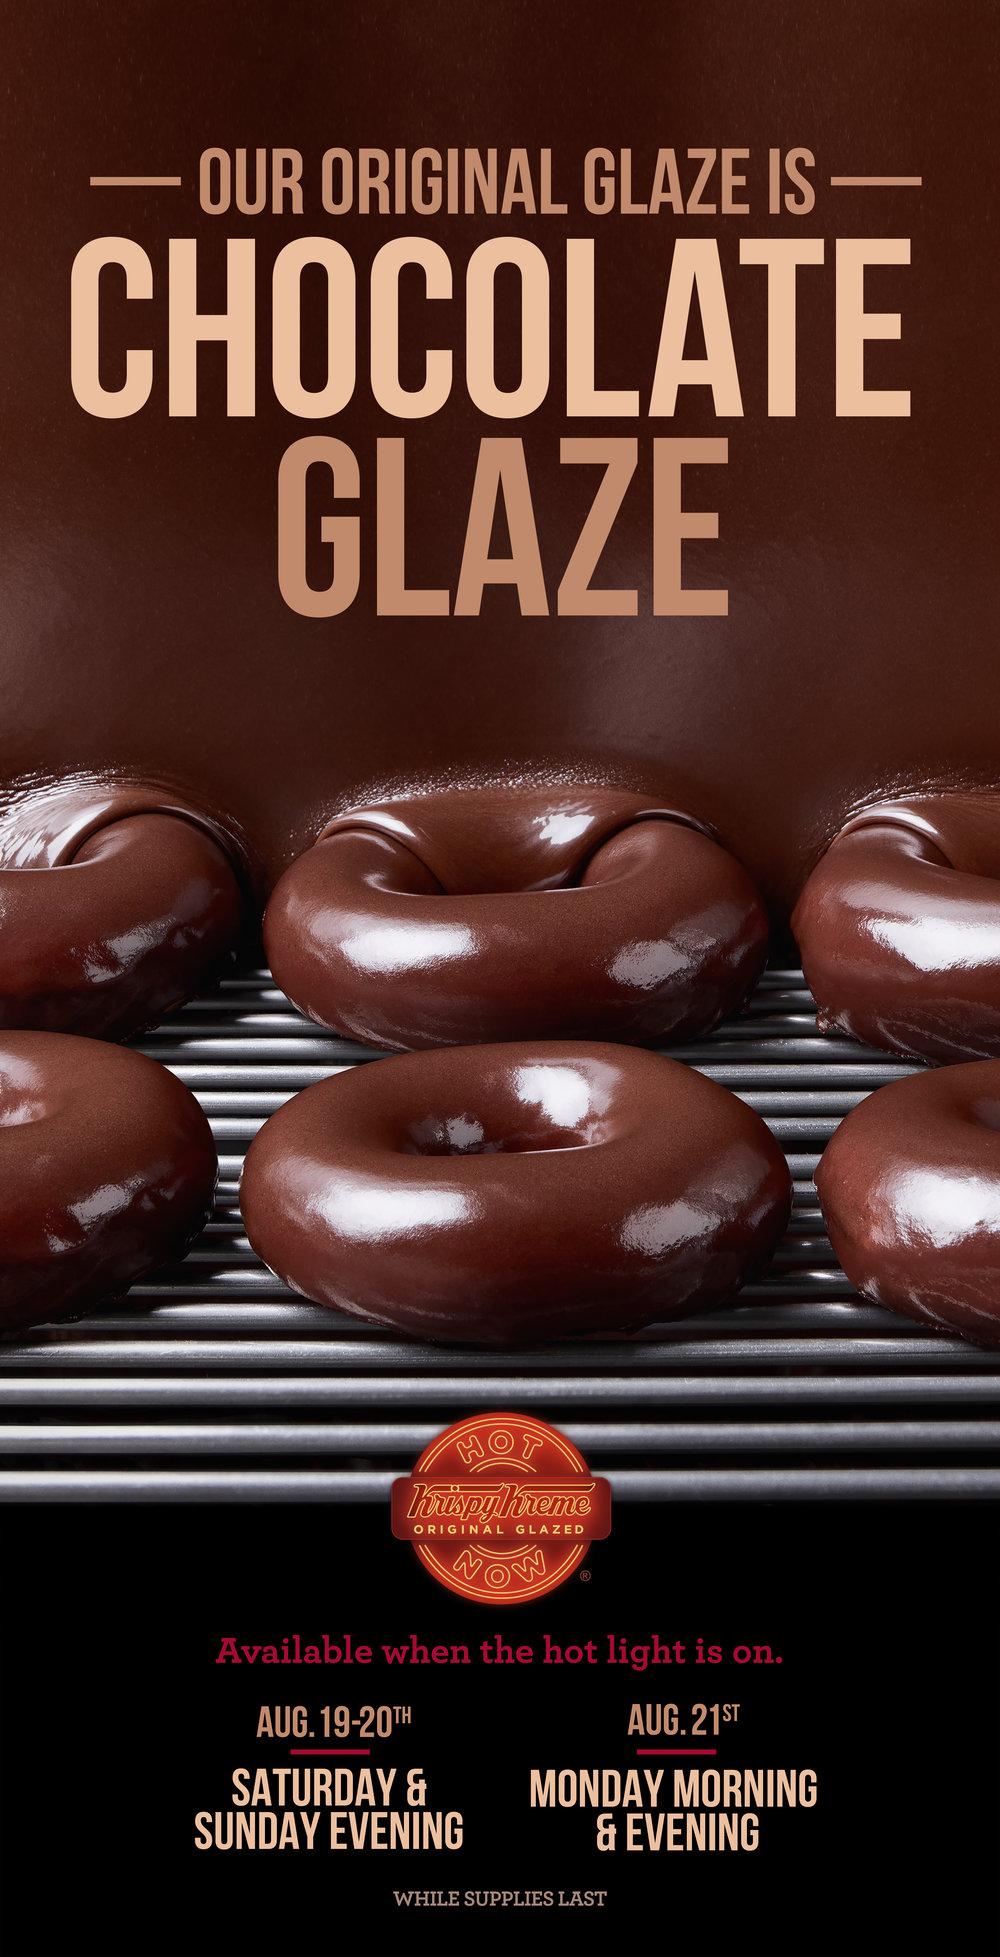 KKD17027_Chocolate Glazer_MenuExtender_11.75x23.jpg